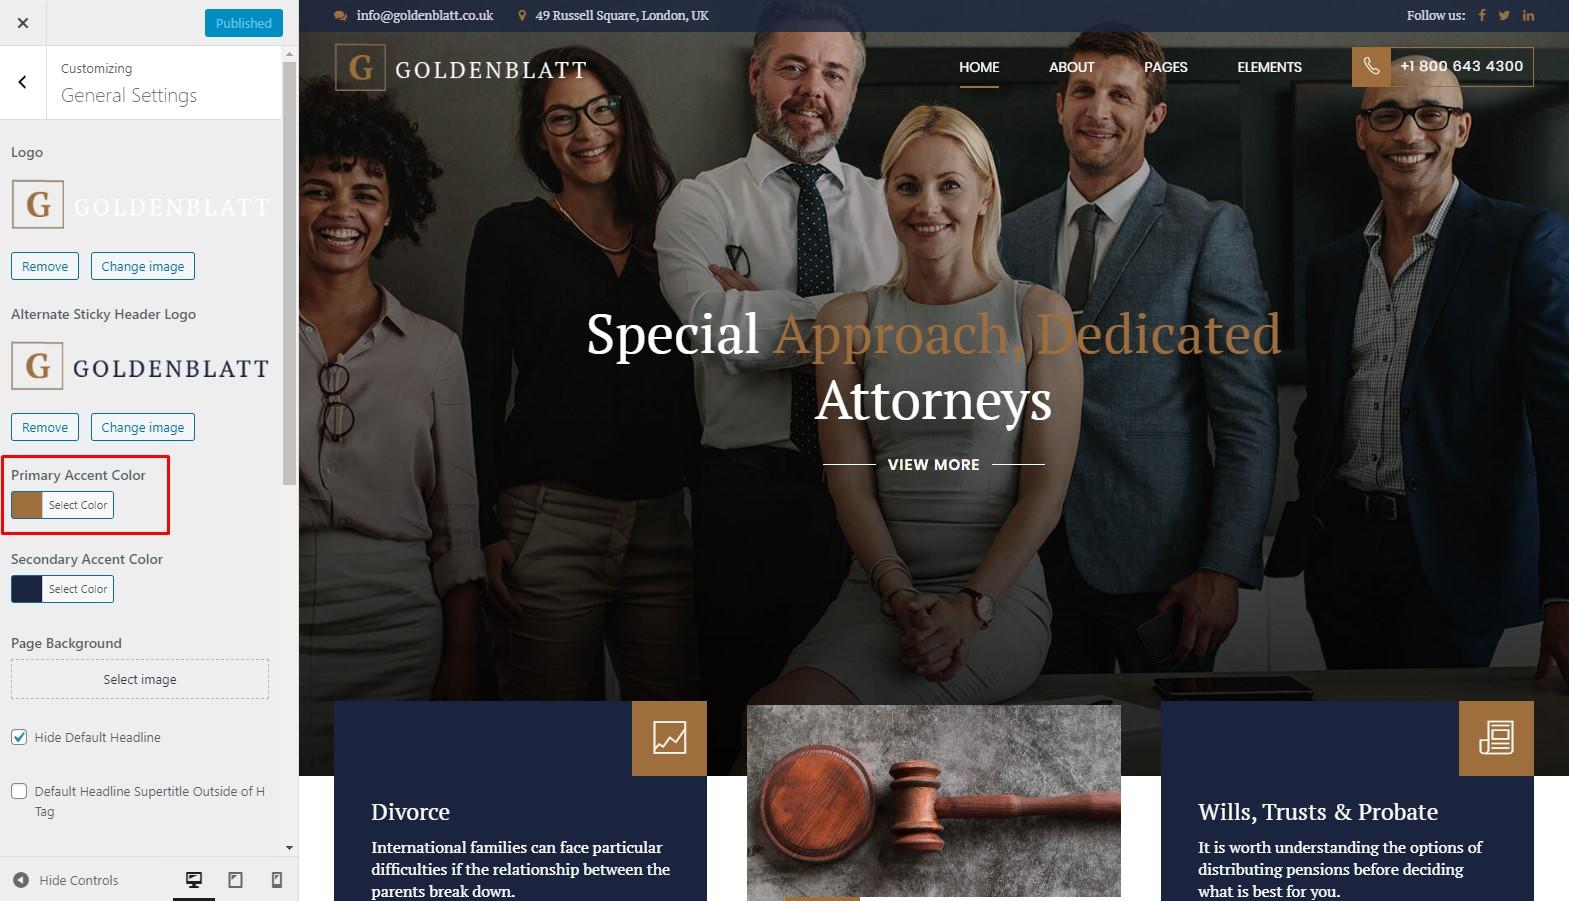 https://documentation.bold-themes.com/goldenblatt/wp-content/uploads/sites/51/2019/11/accent-color.jpg